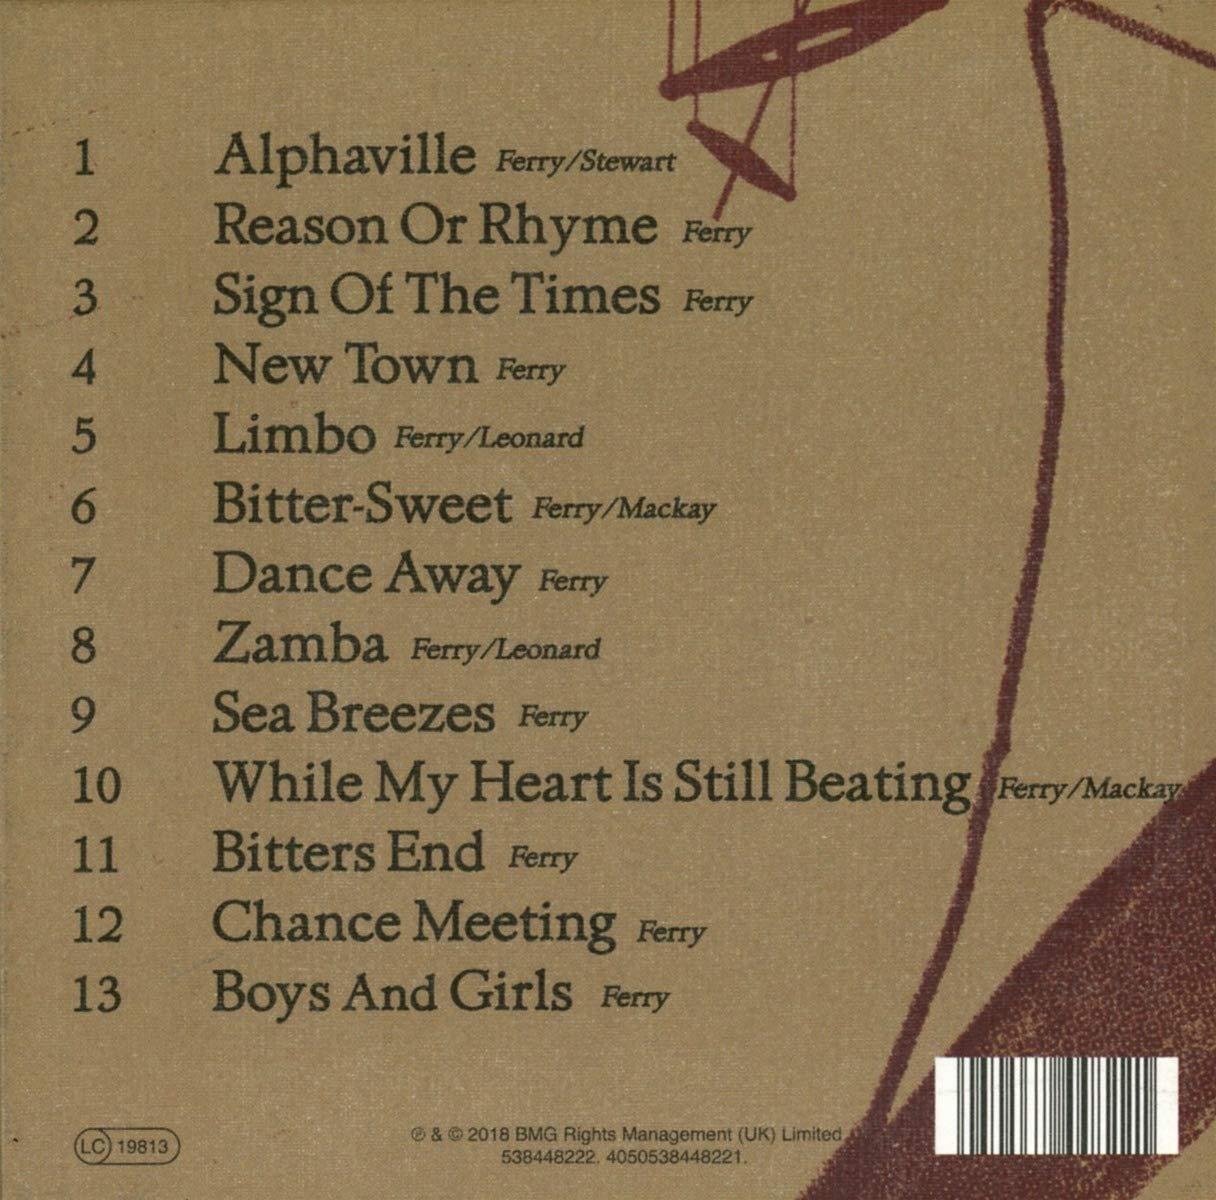 Cumplir áspero Sobretodo  Bryan Ferry - Bitter-Sweet (Deluxe) - Amazon.com Music